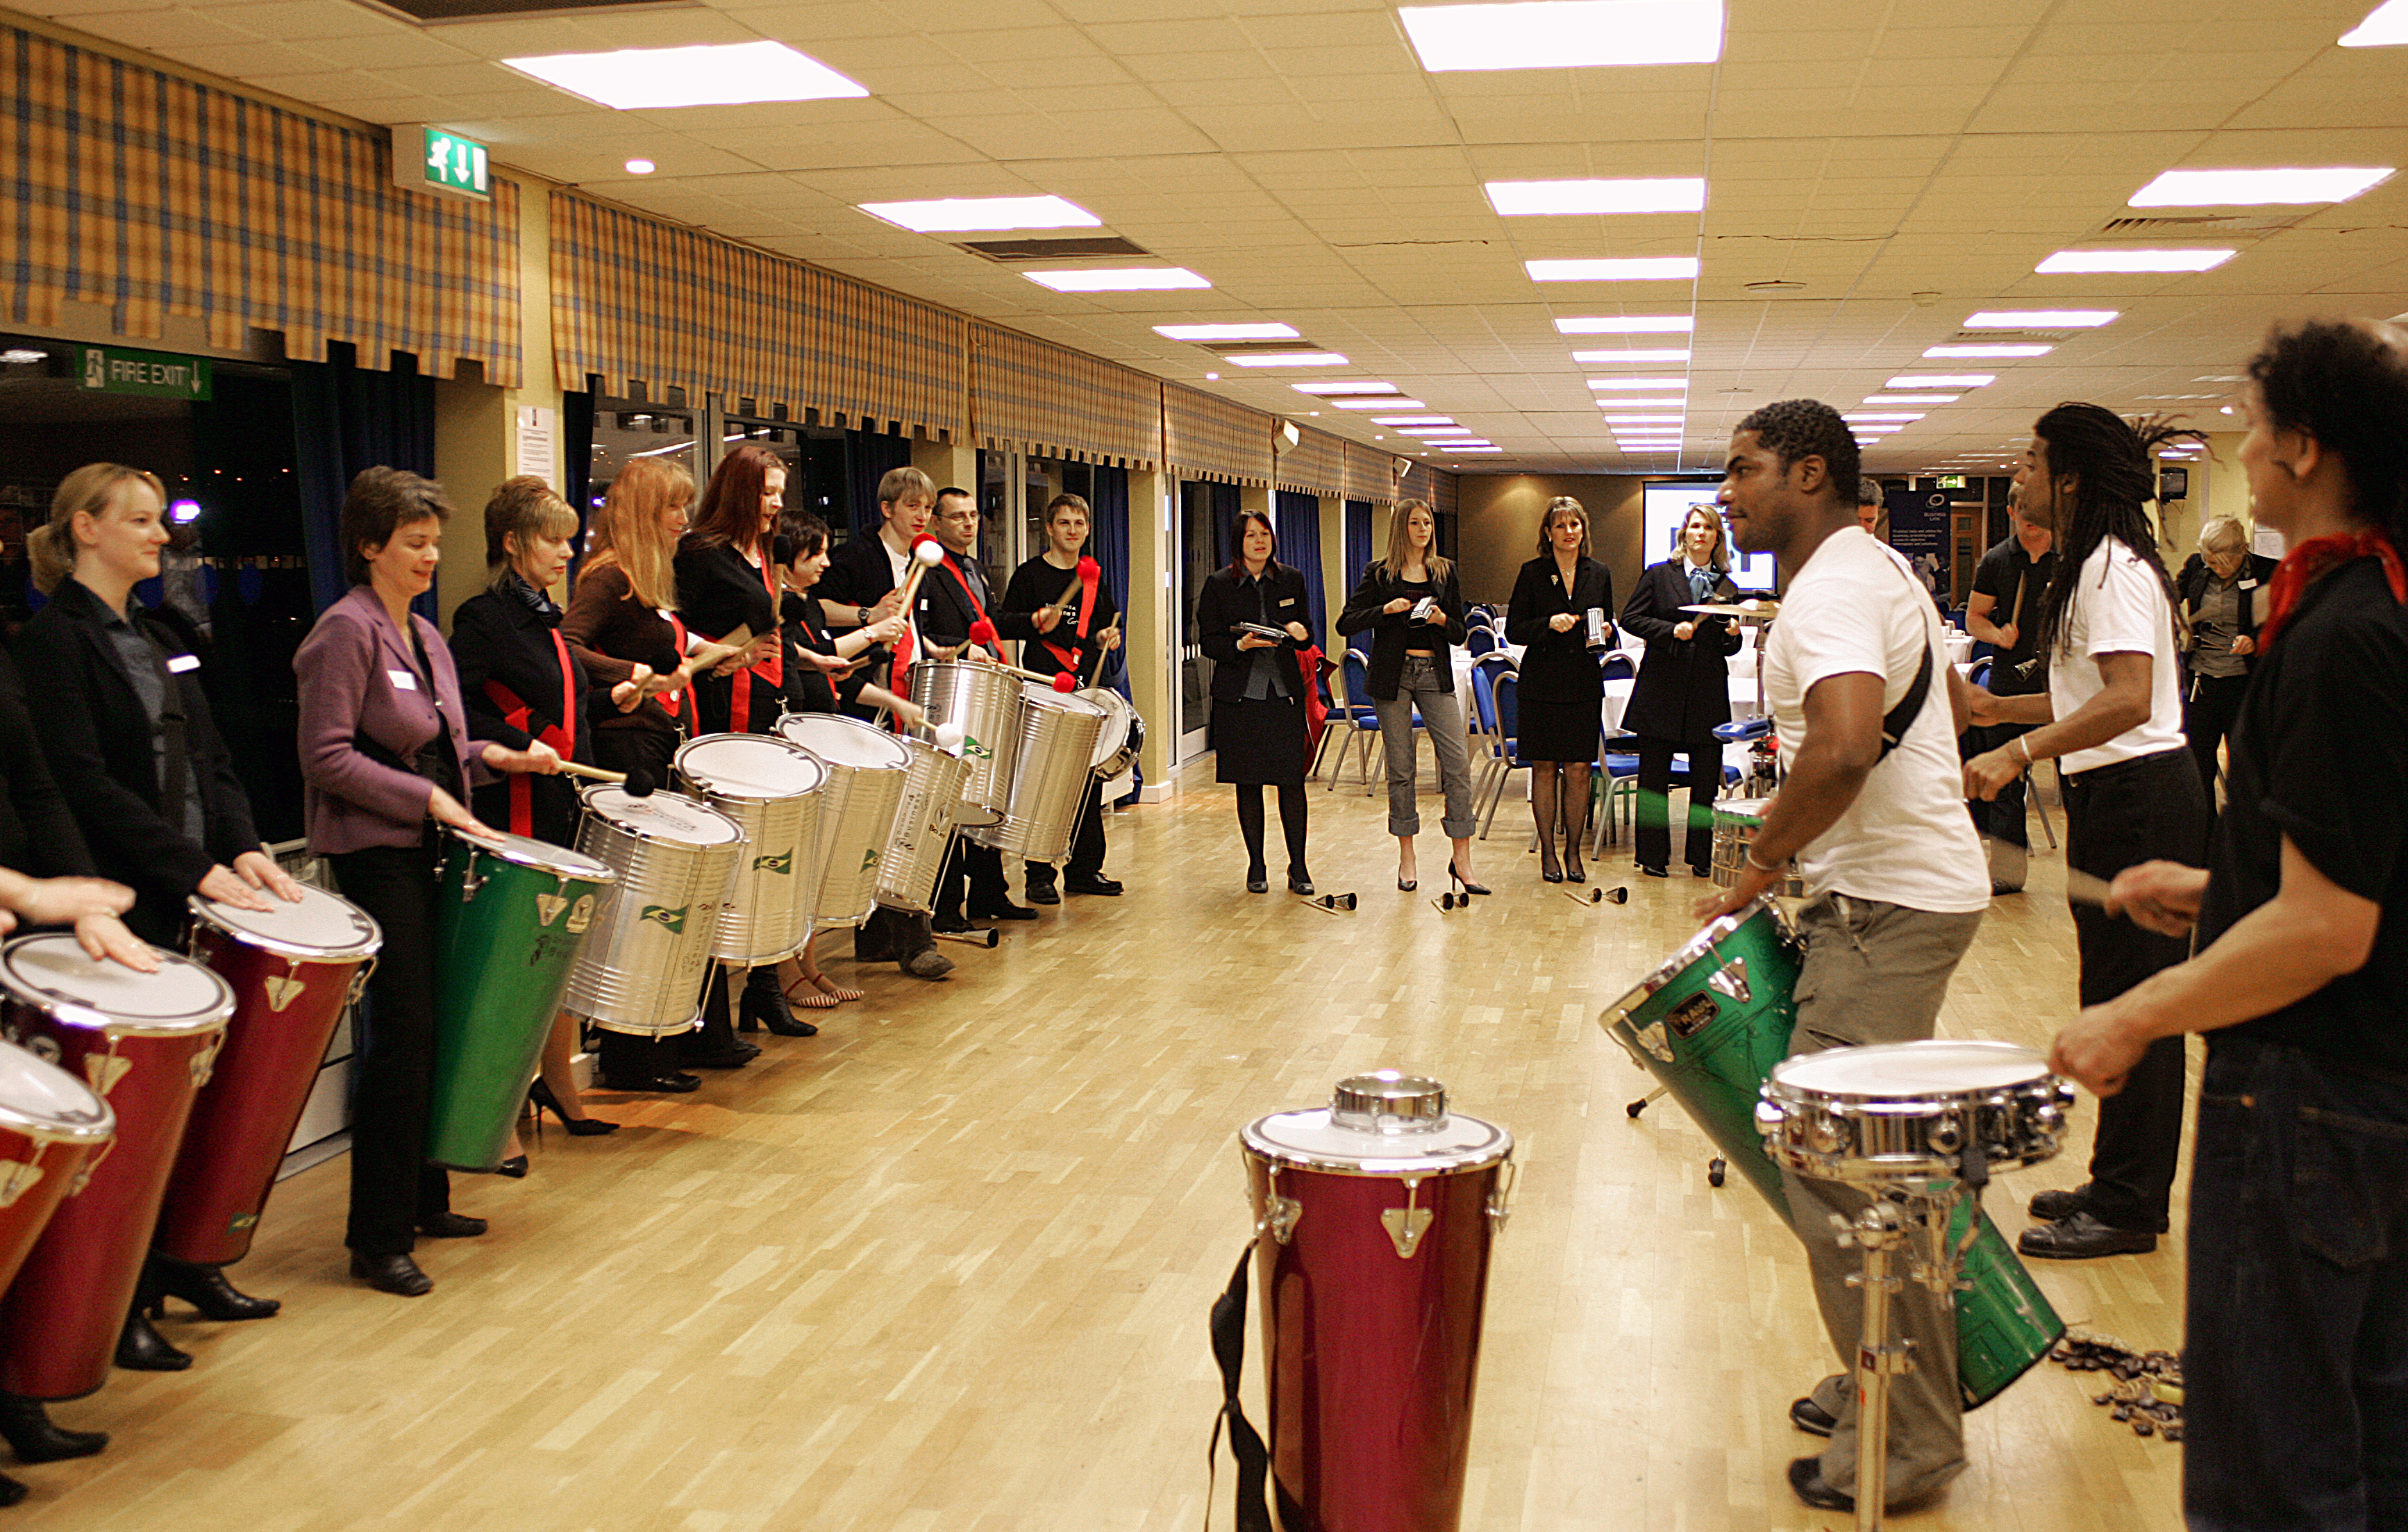 Drumming 4 Business